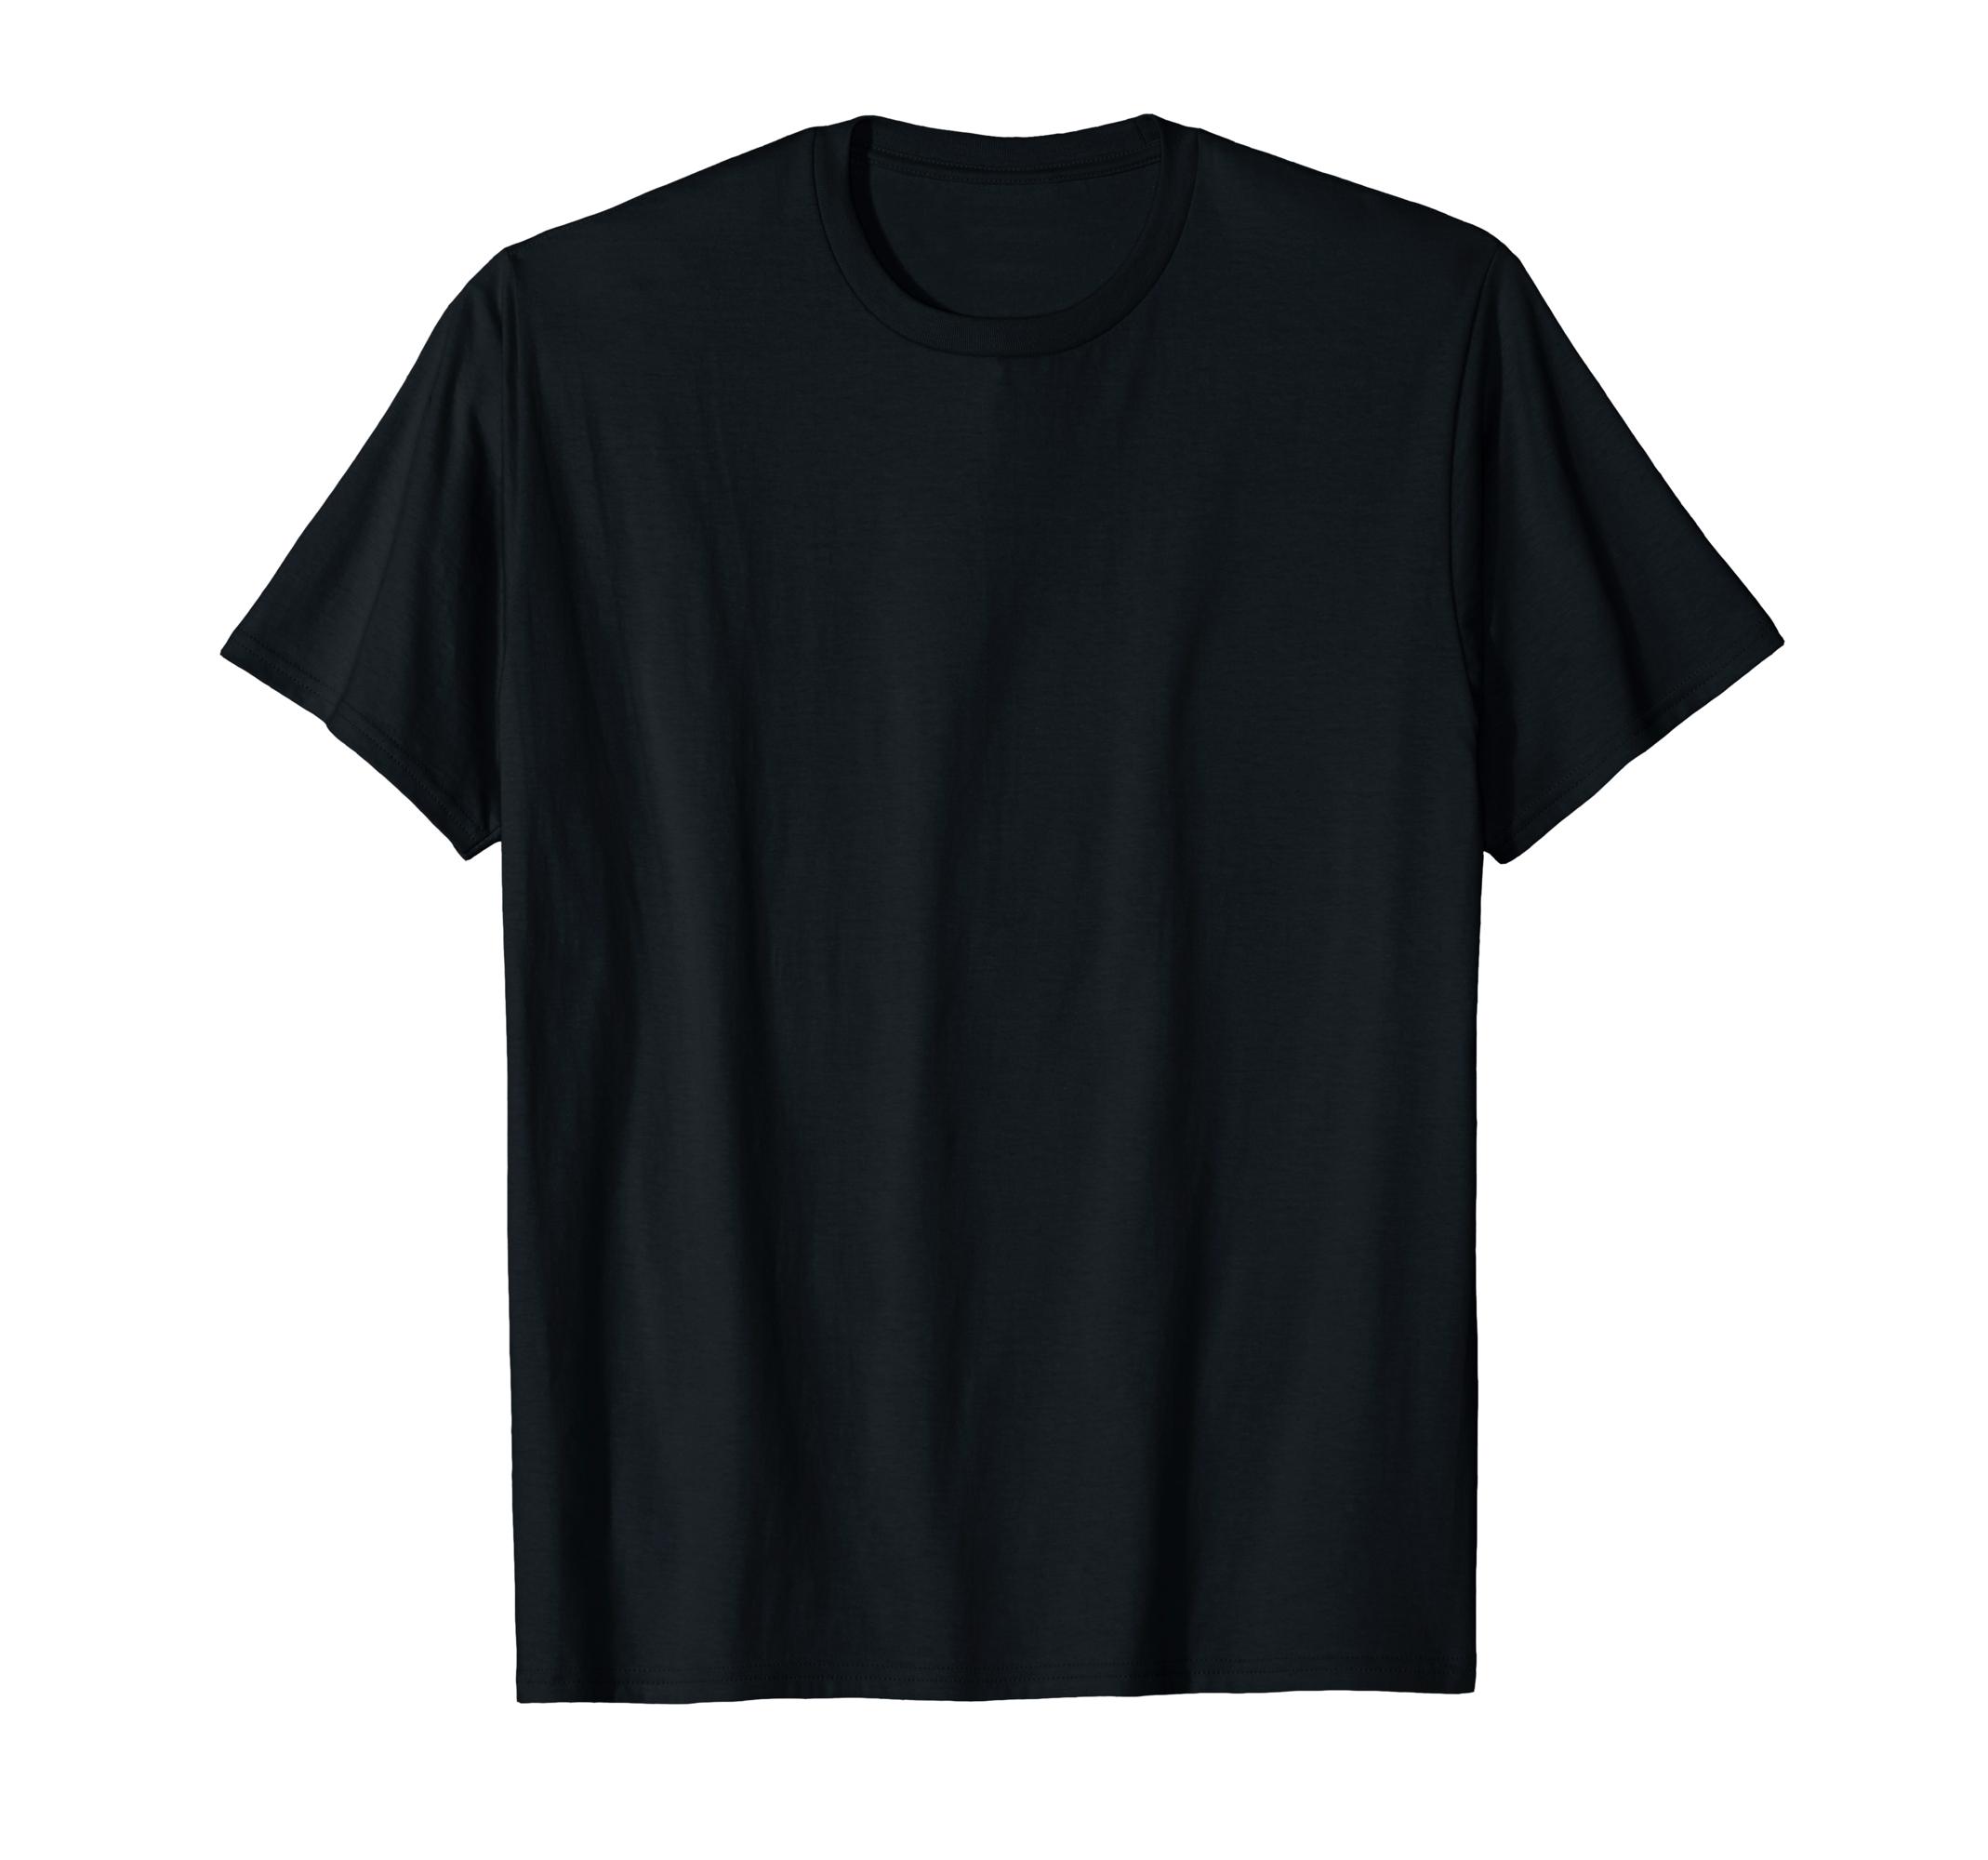 Black MTV Neon Distressed Checkered Logo Graphic T-Shirt  US Men/'s trend 2019